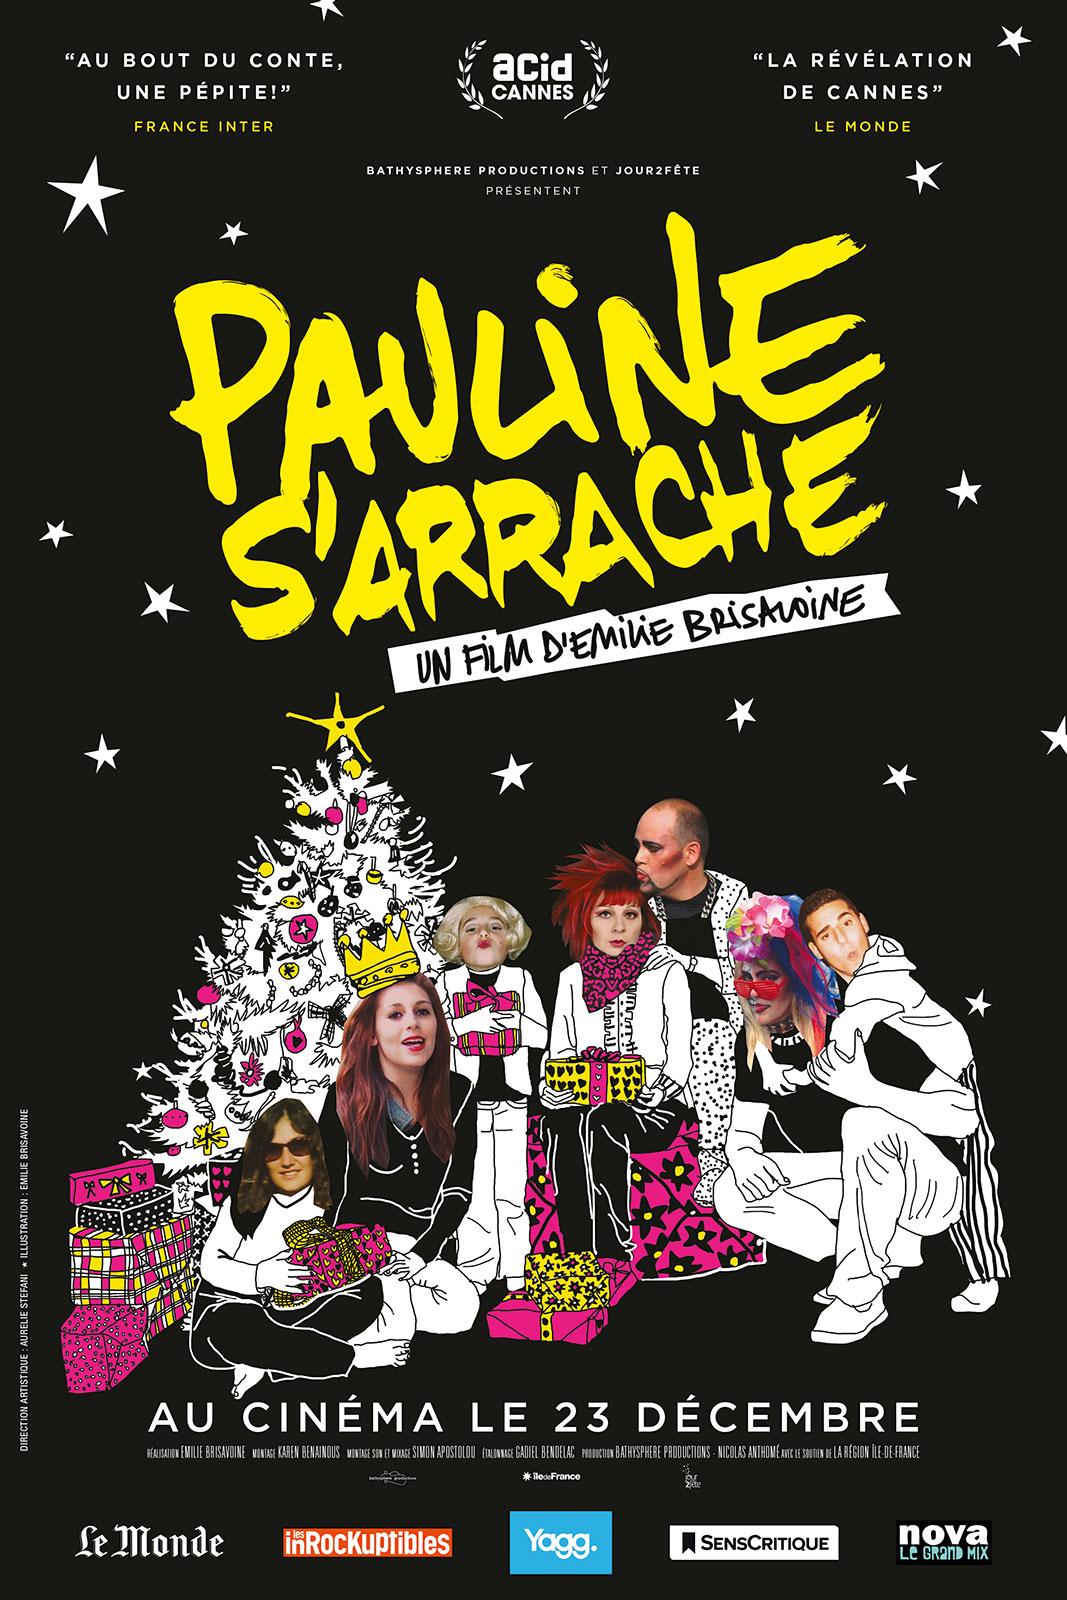 Pauline s